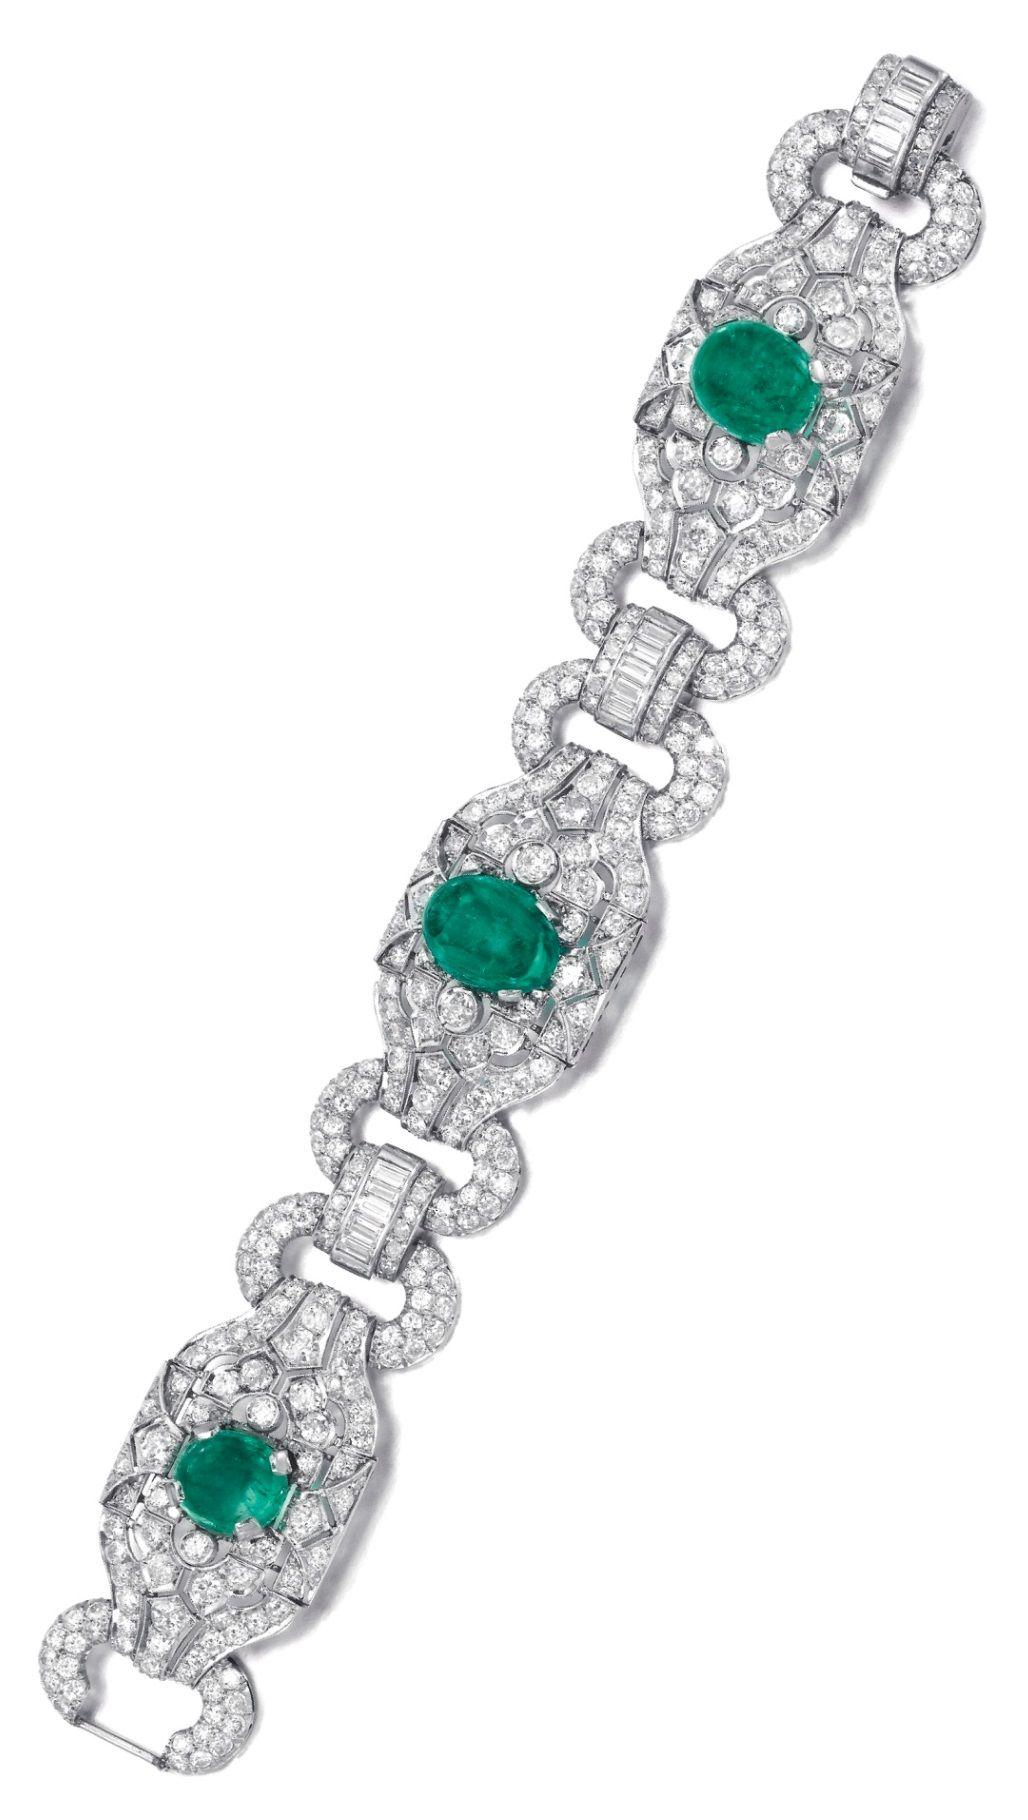 An art deco emerald and diamond bracelet s of geometric